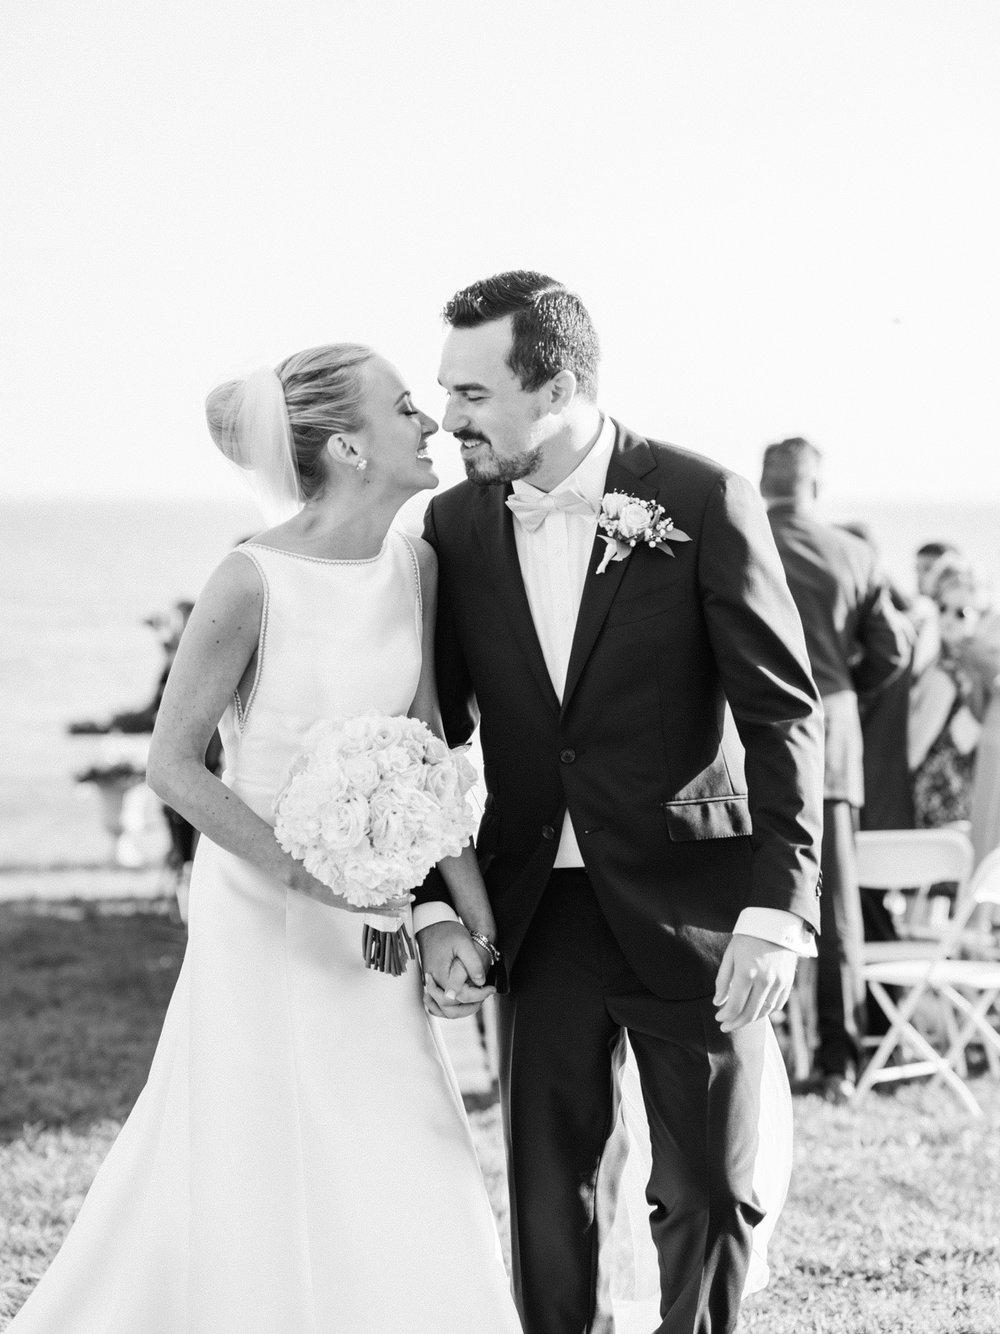 hannah-cochran-photography-bob-and-hayley-wedding-194.jpg